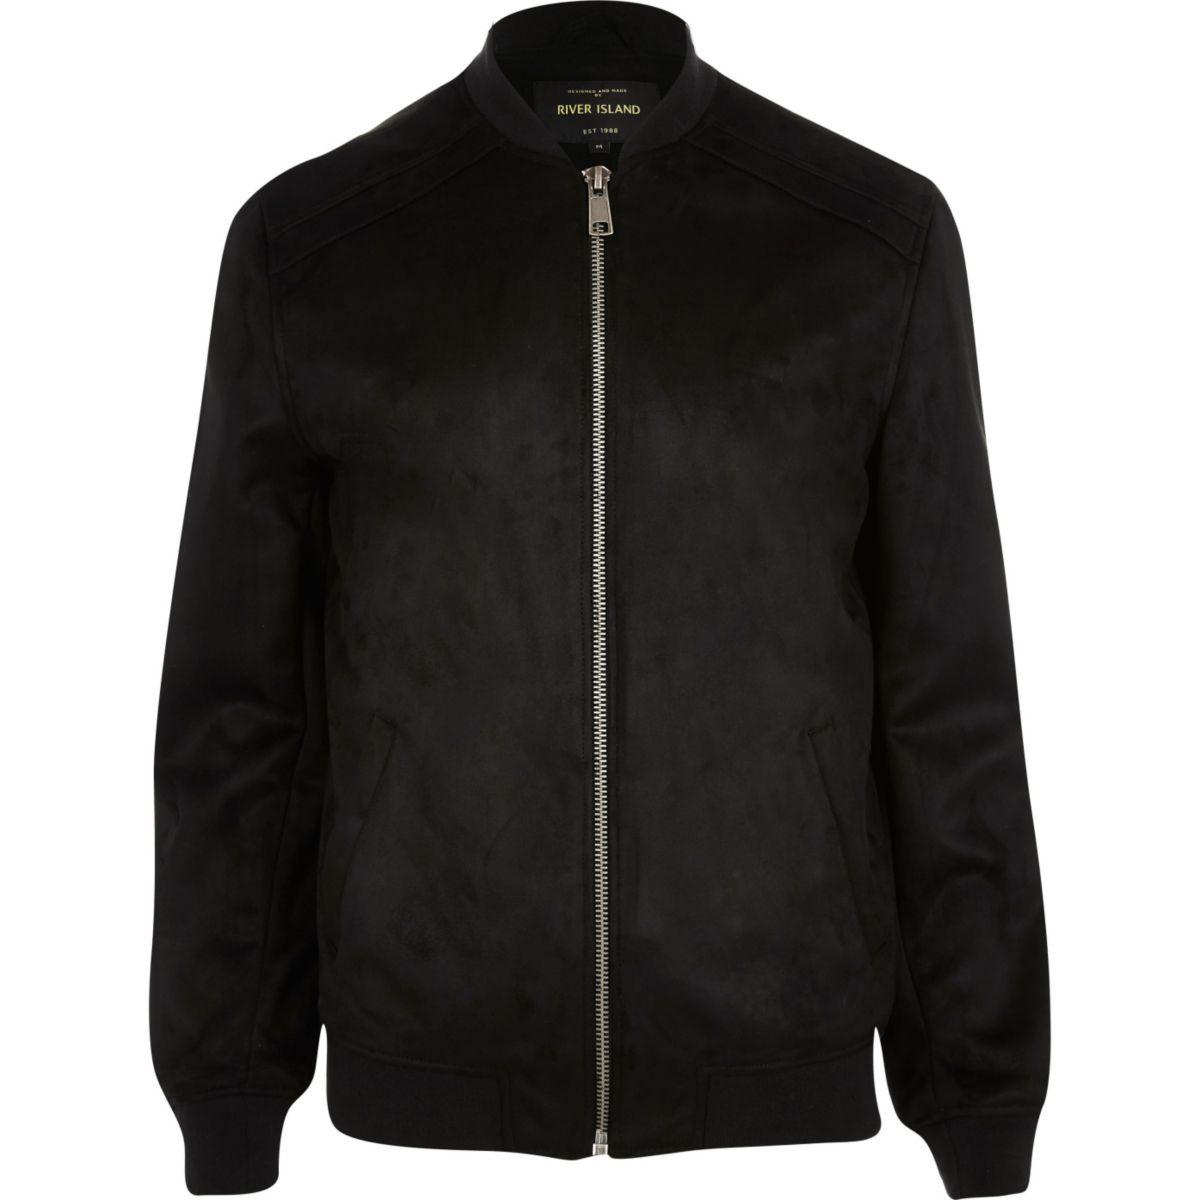 Black faux suede bomber jacket